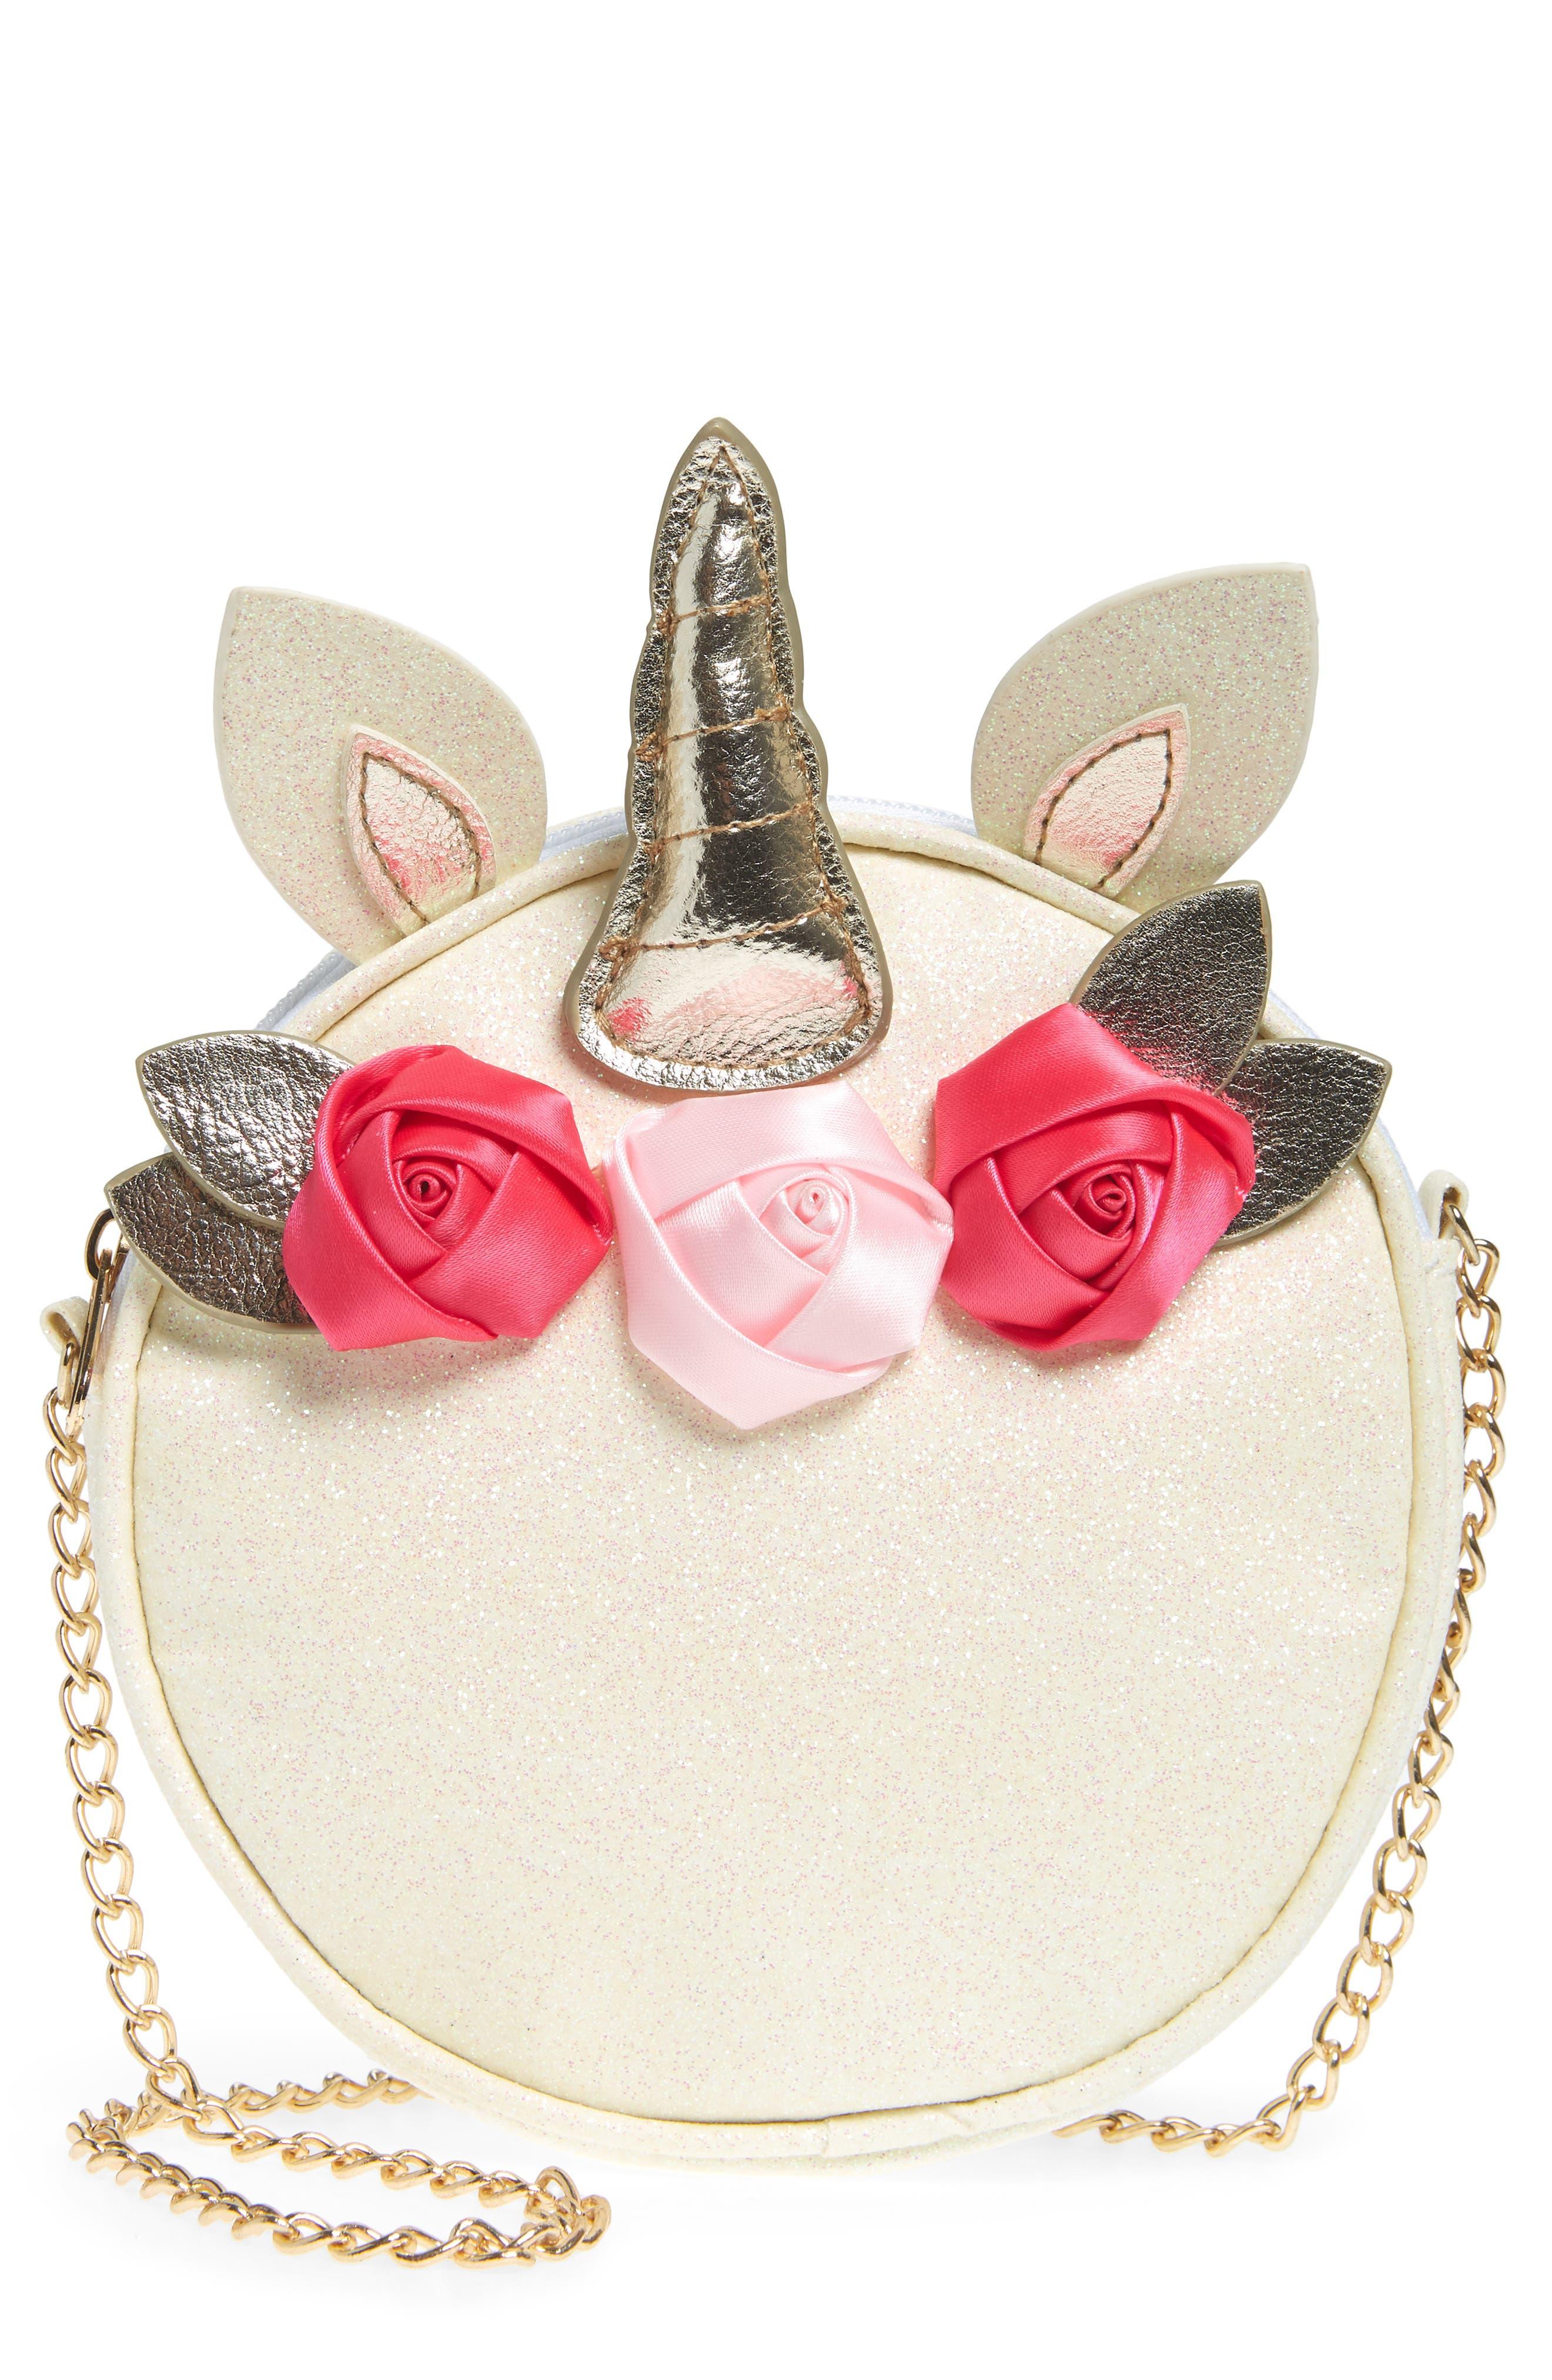 Girls Capelli New York Unicorn With Flowers Faux Leather Crossbody Bag  Metallic